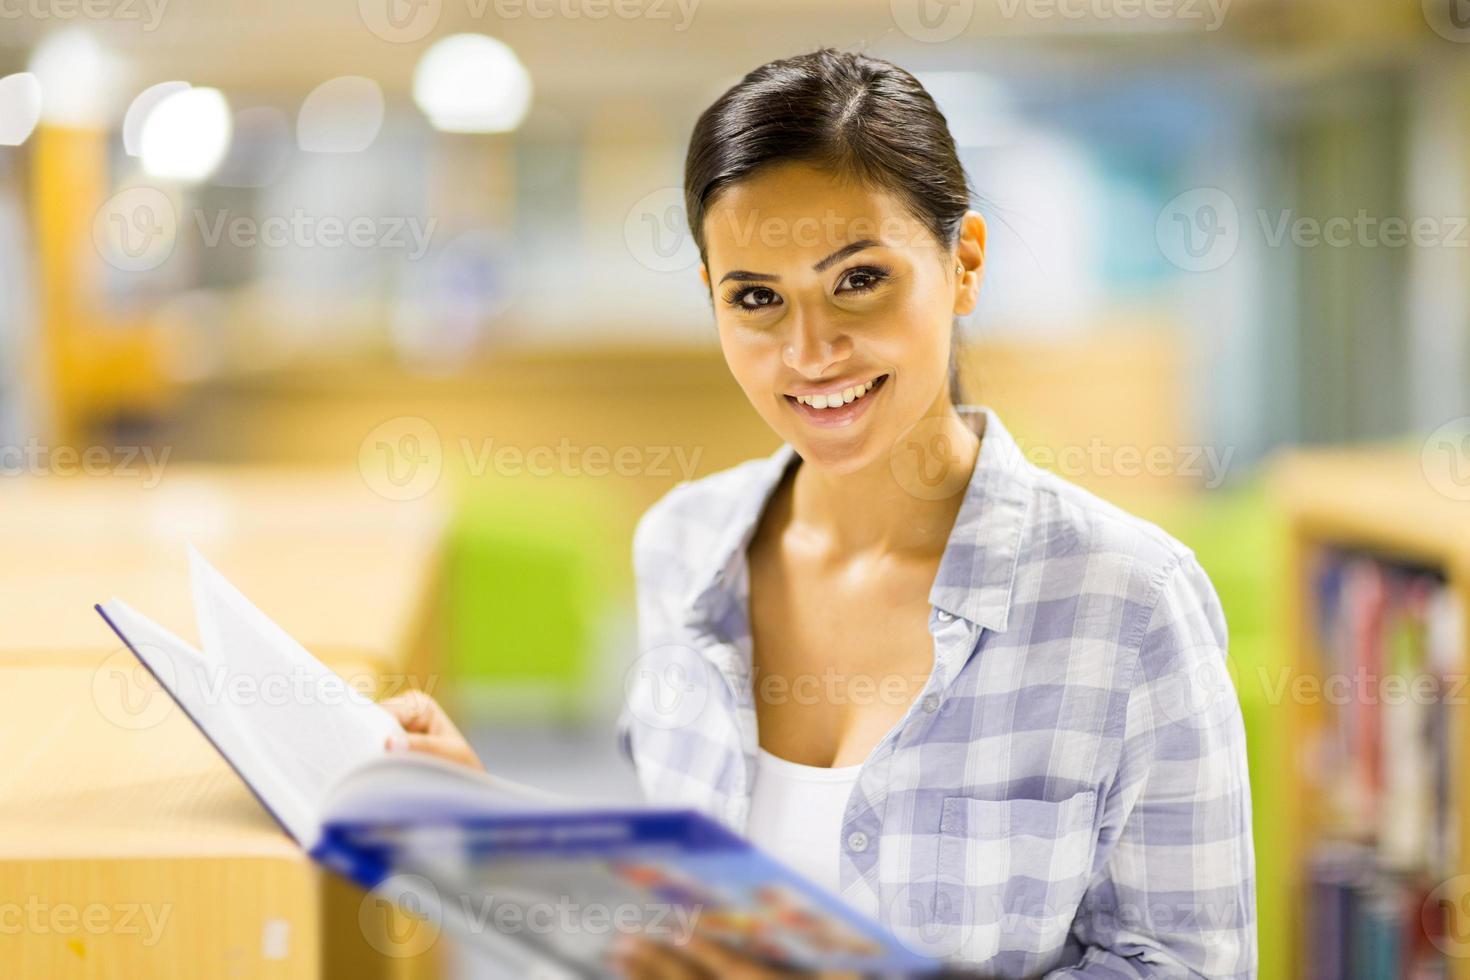 chica universitaria leyendo un libro foto